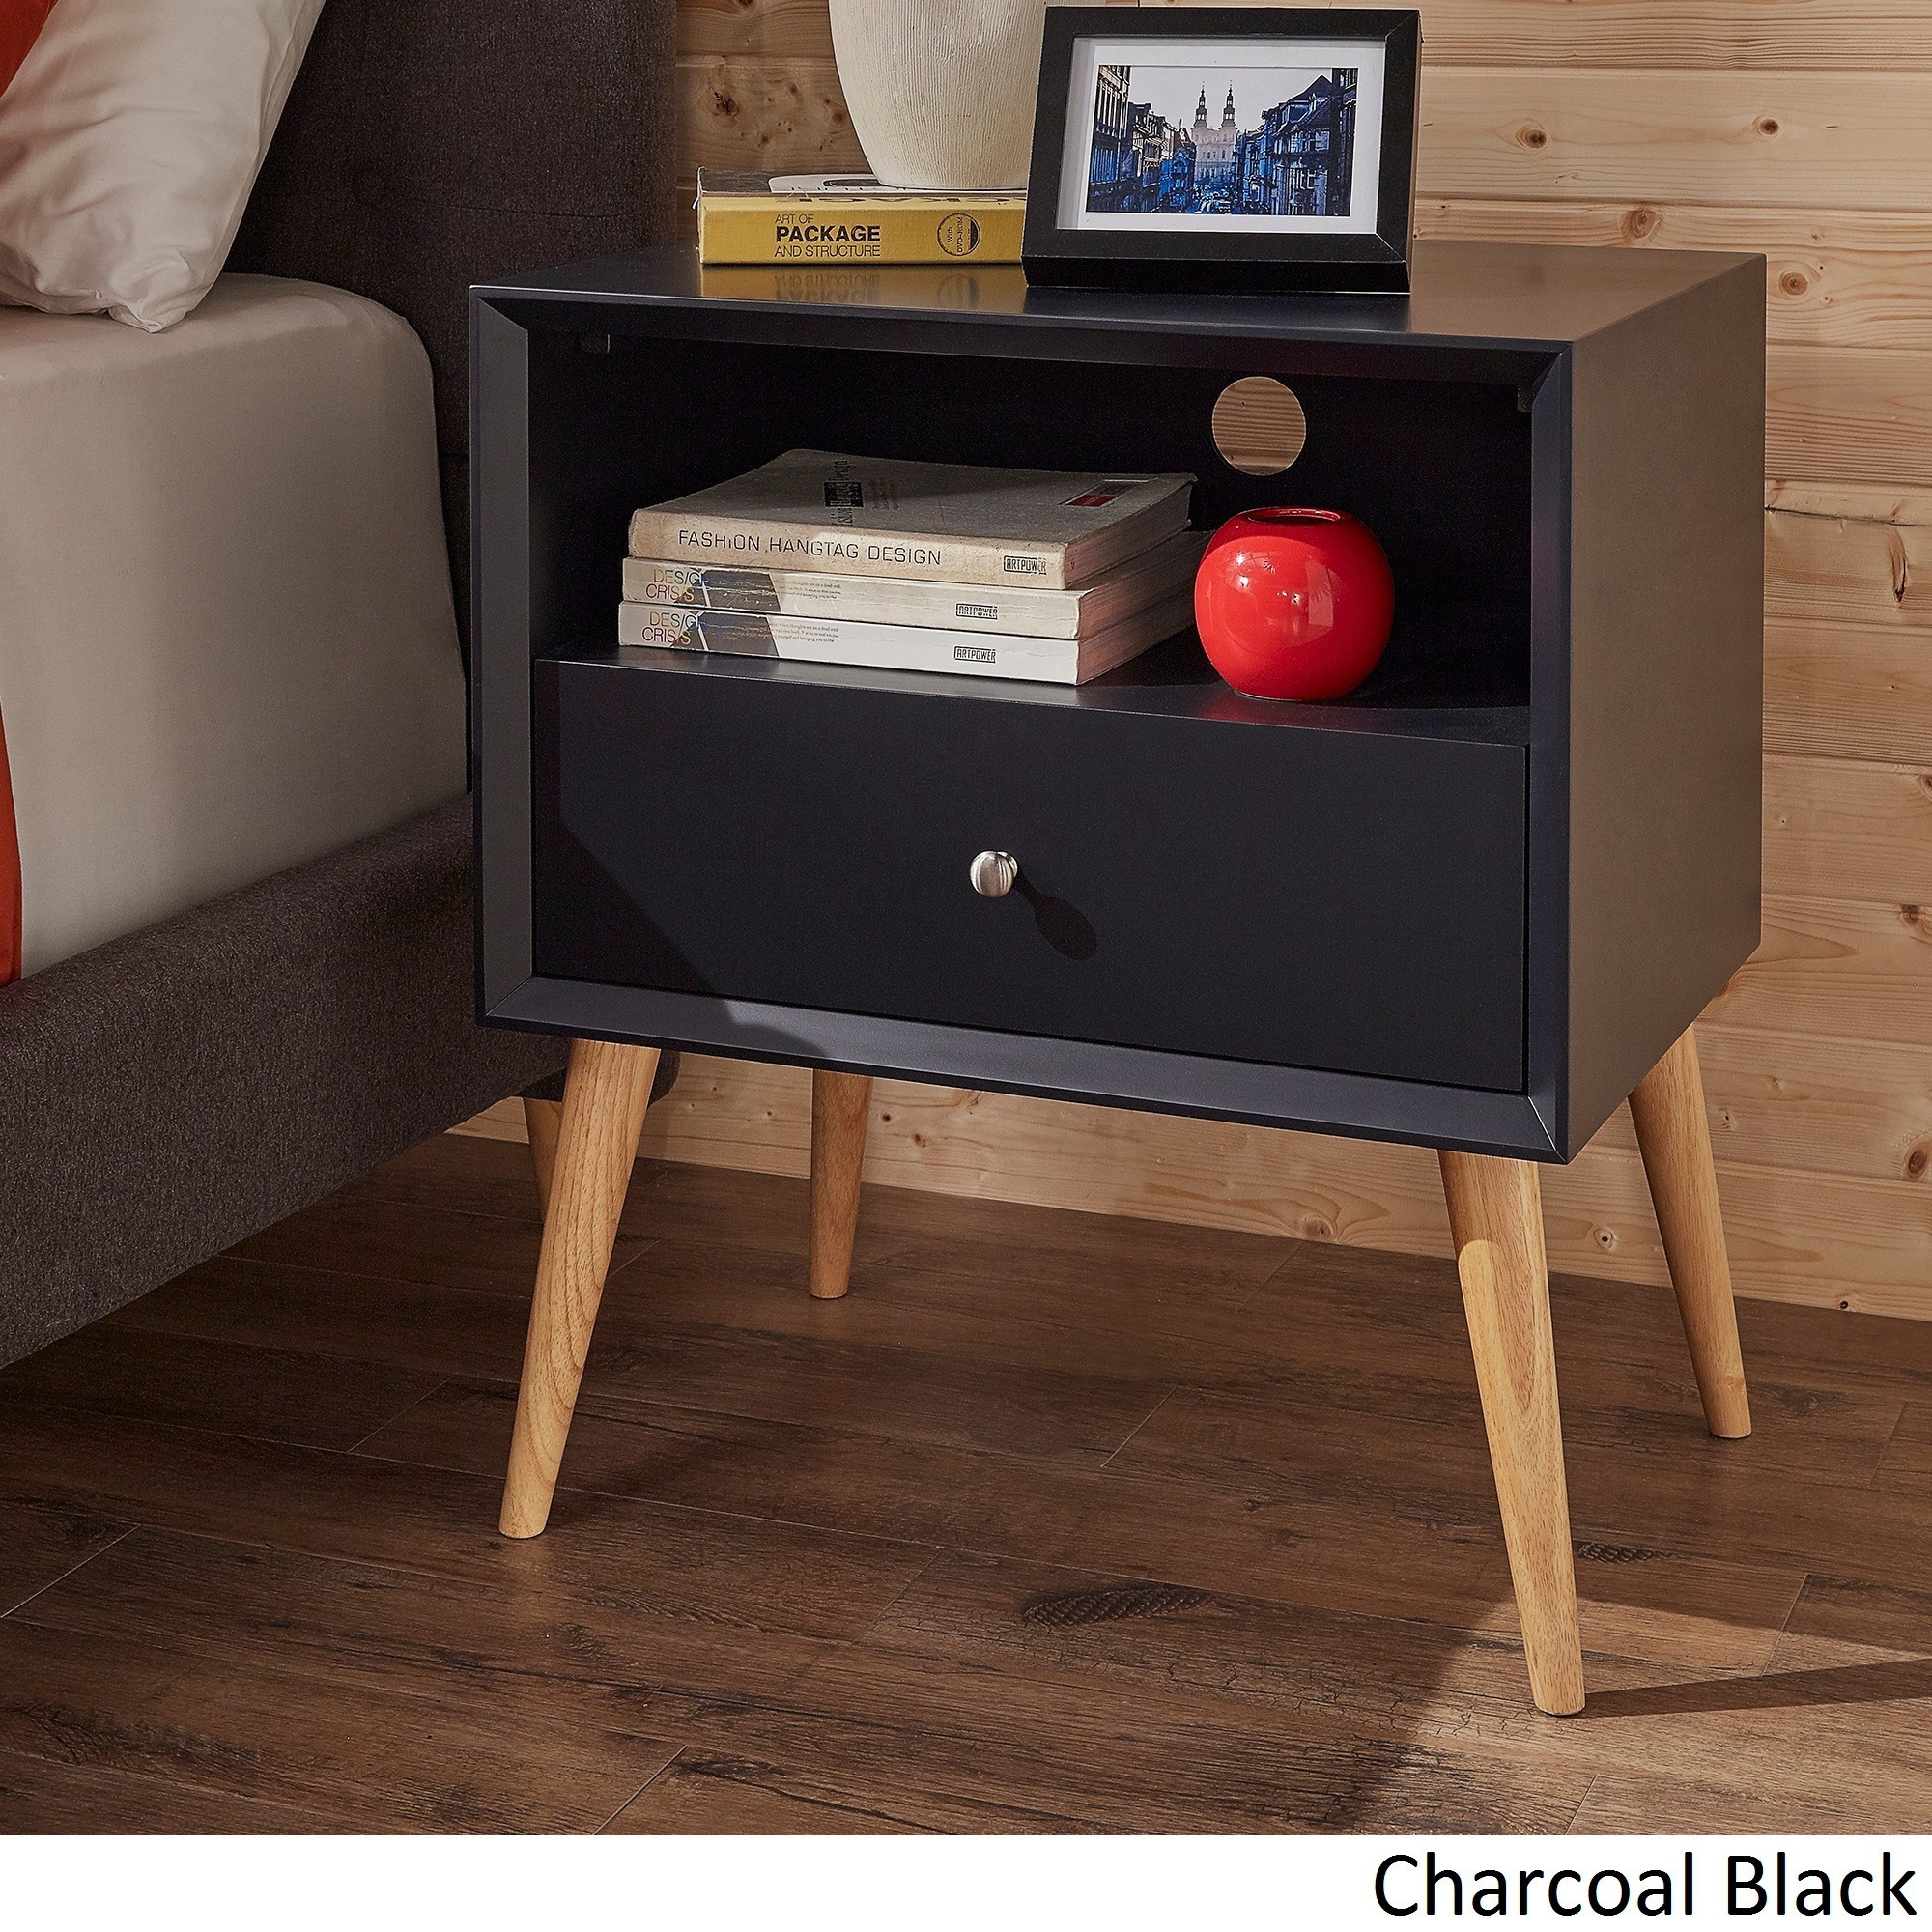 Full Size of Shelving:rare Buy Wood Shelves Online Fascinate Buy Wood Wall  Shelves Perfect ...